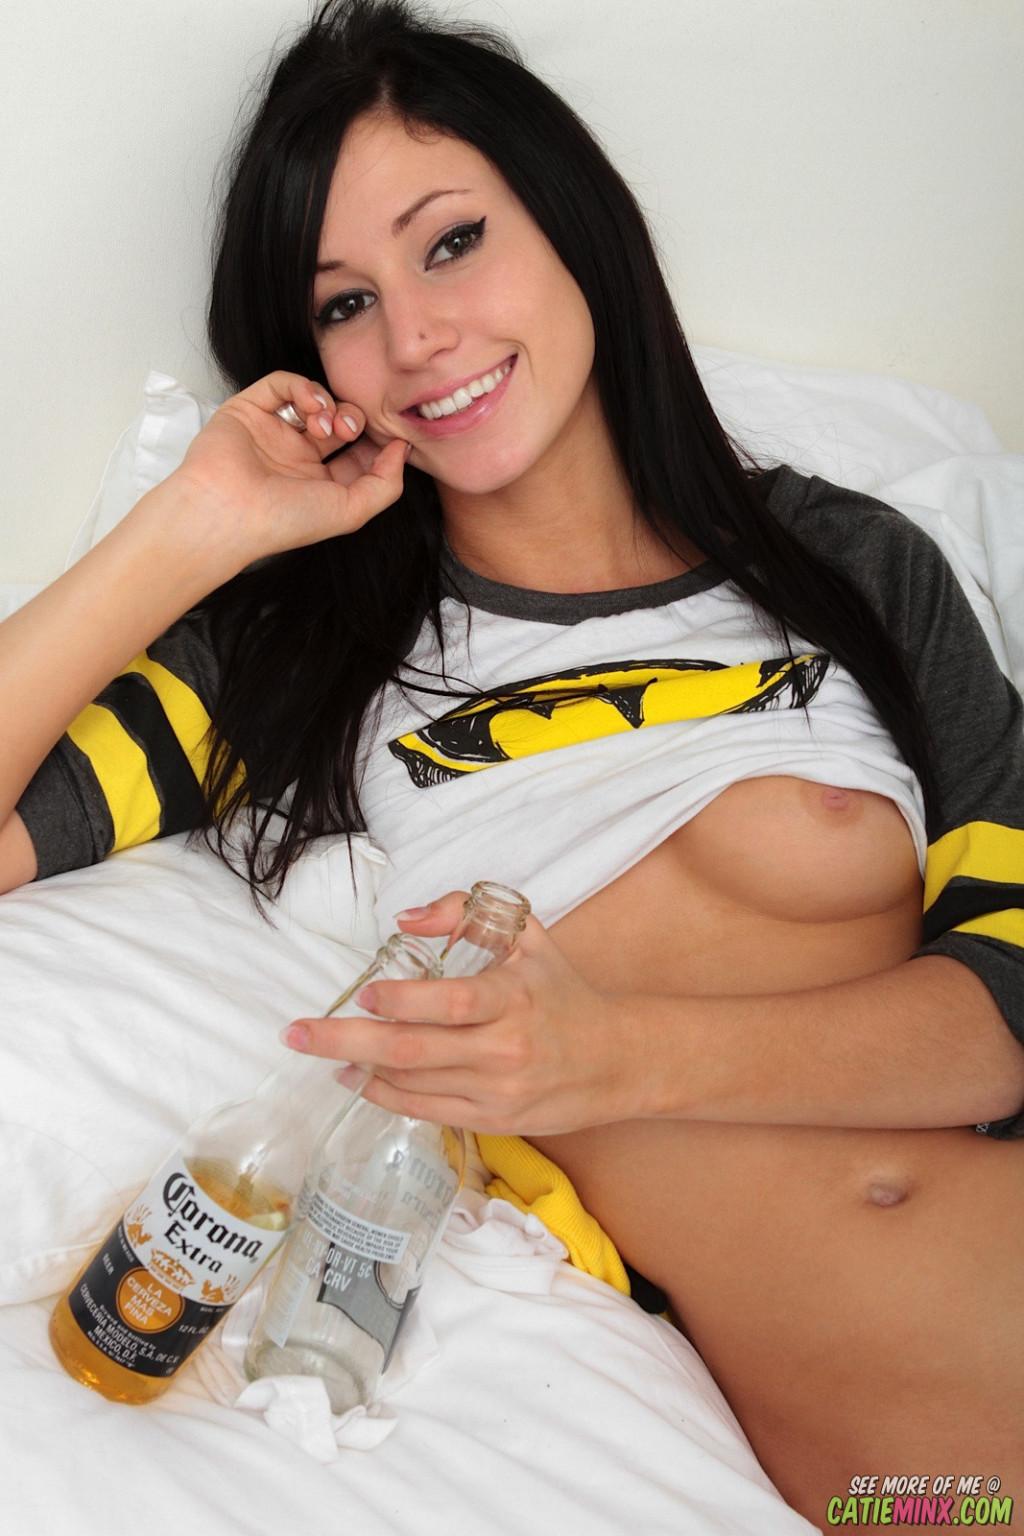 Catie Minx - Бутылки - Галерея № 3289405